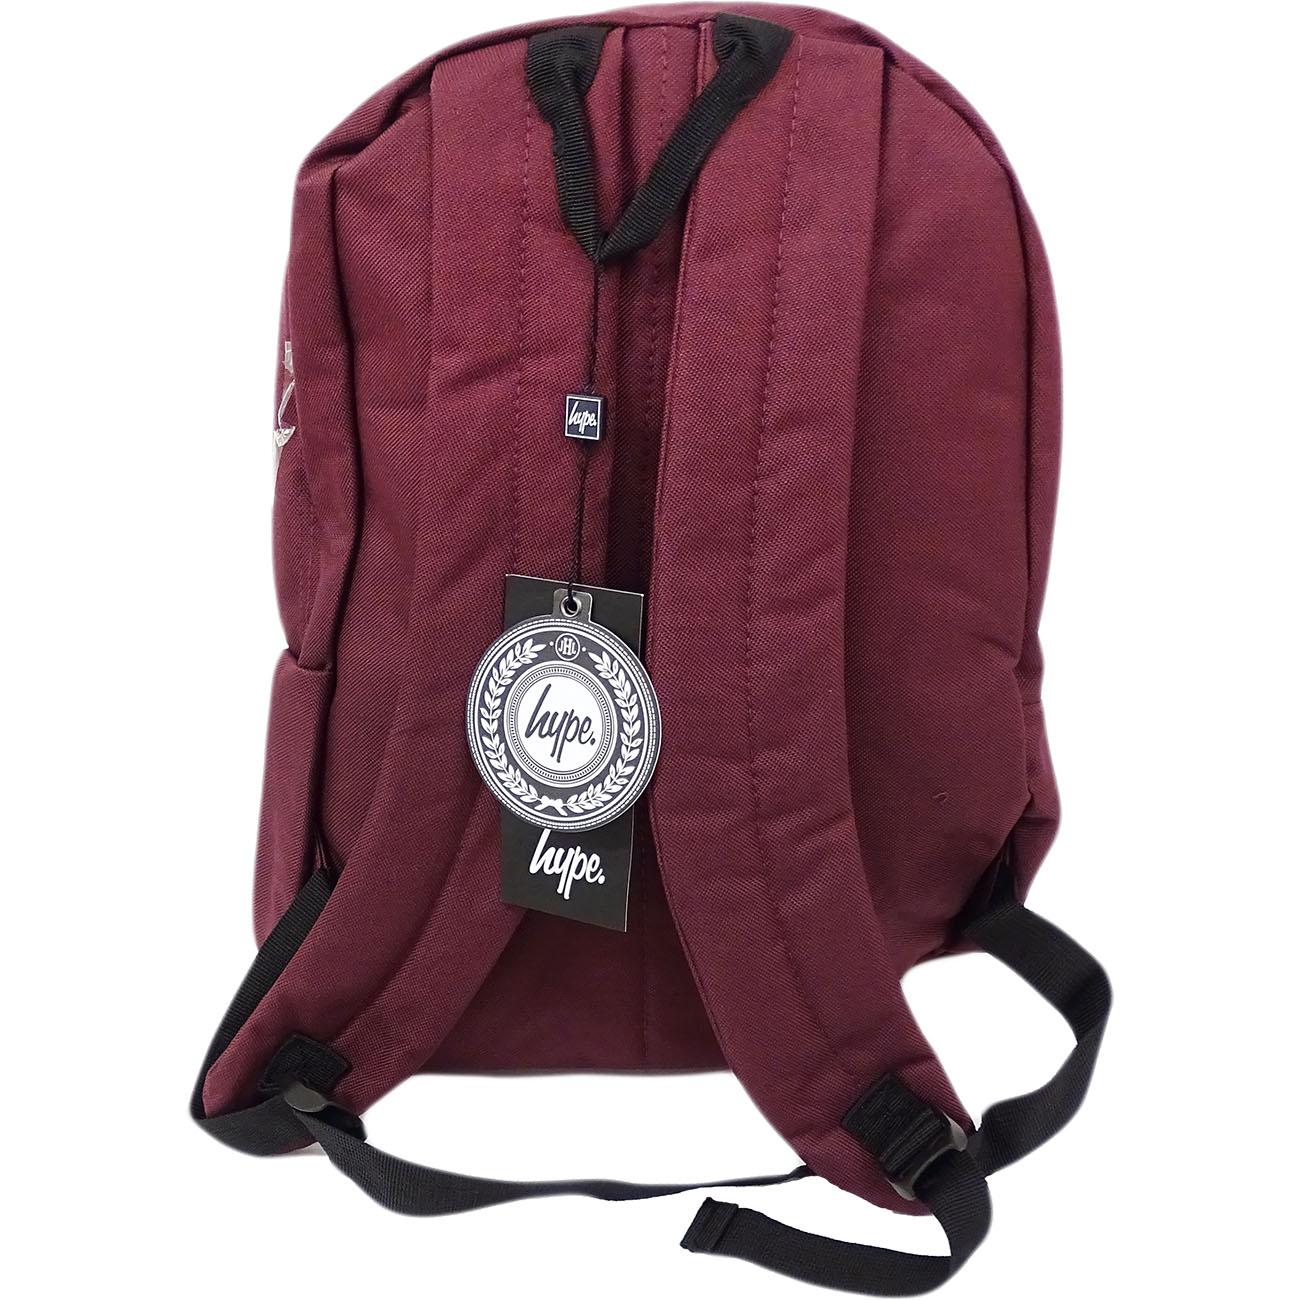 Unisexe-Hype-Sac-A-Dos-Ecole-Gym-SACS-pochettes-pencil-case miniature 150